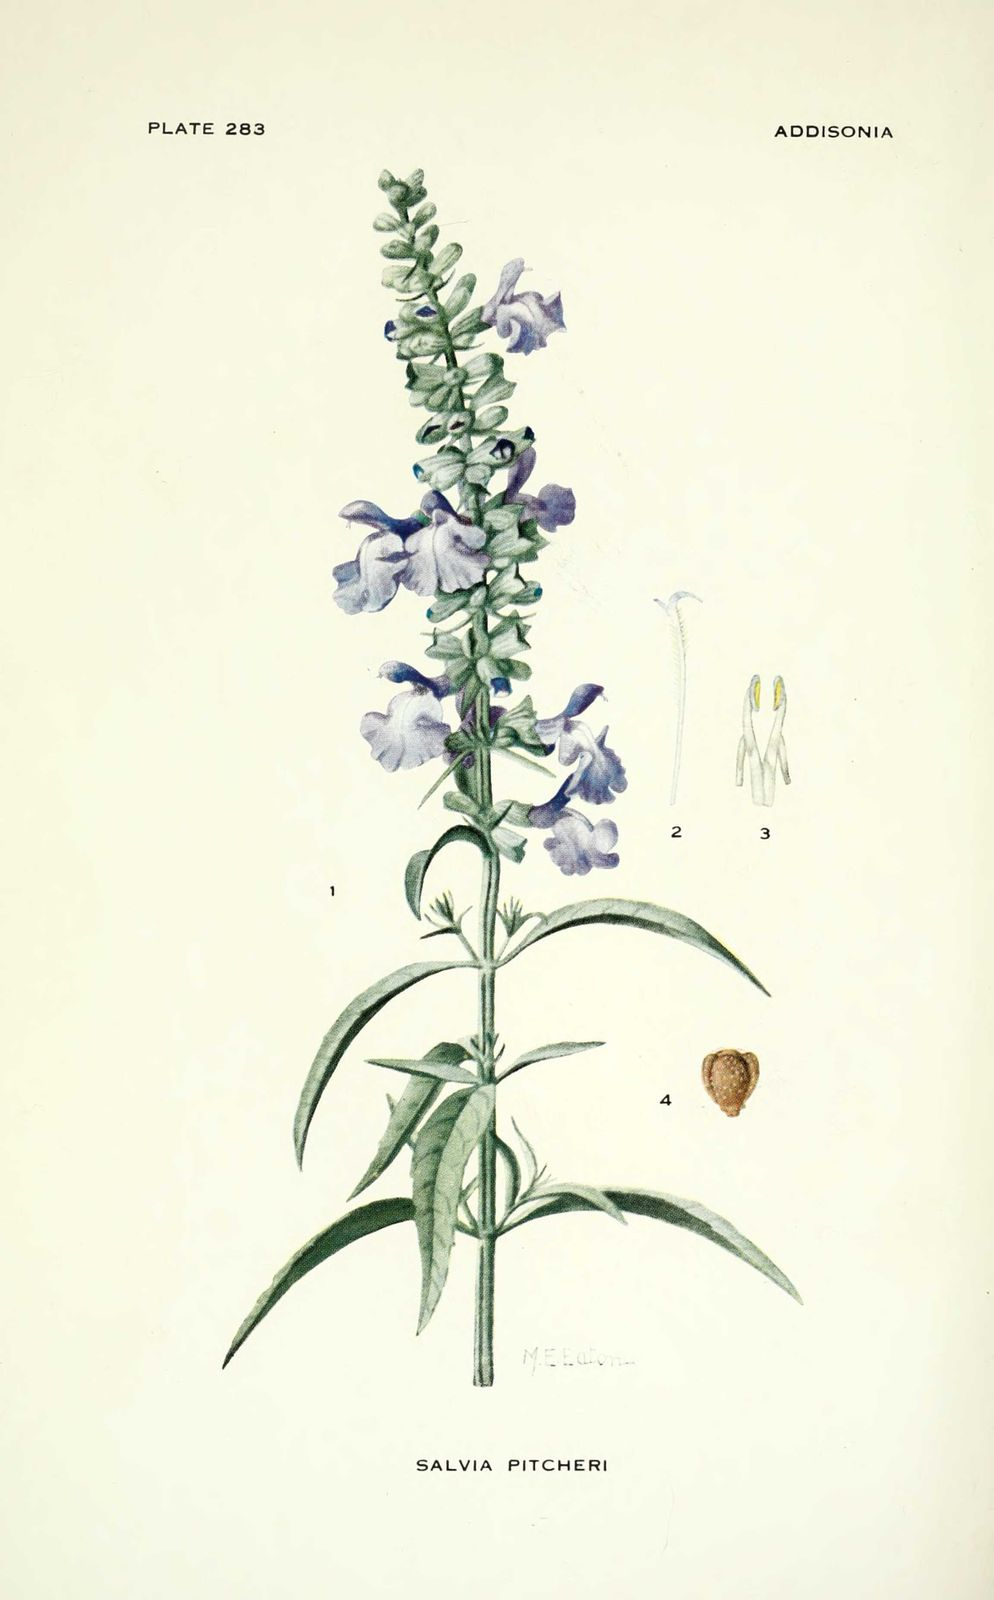 gravure fleur salvia pitcheri (azurea) - sauge des prairies